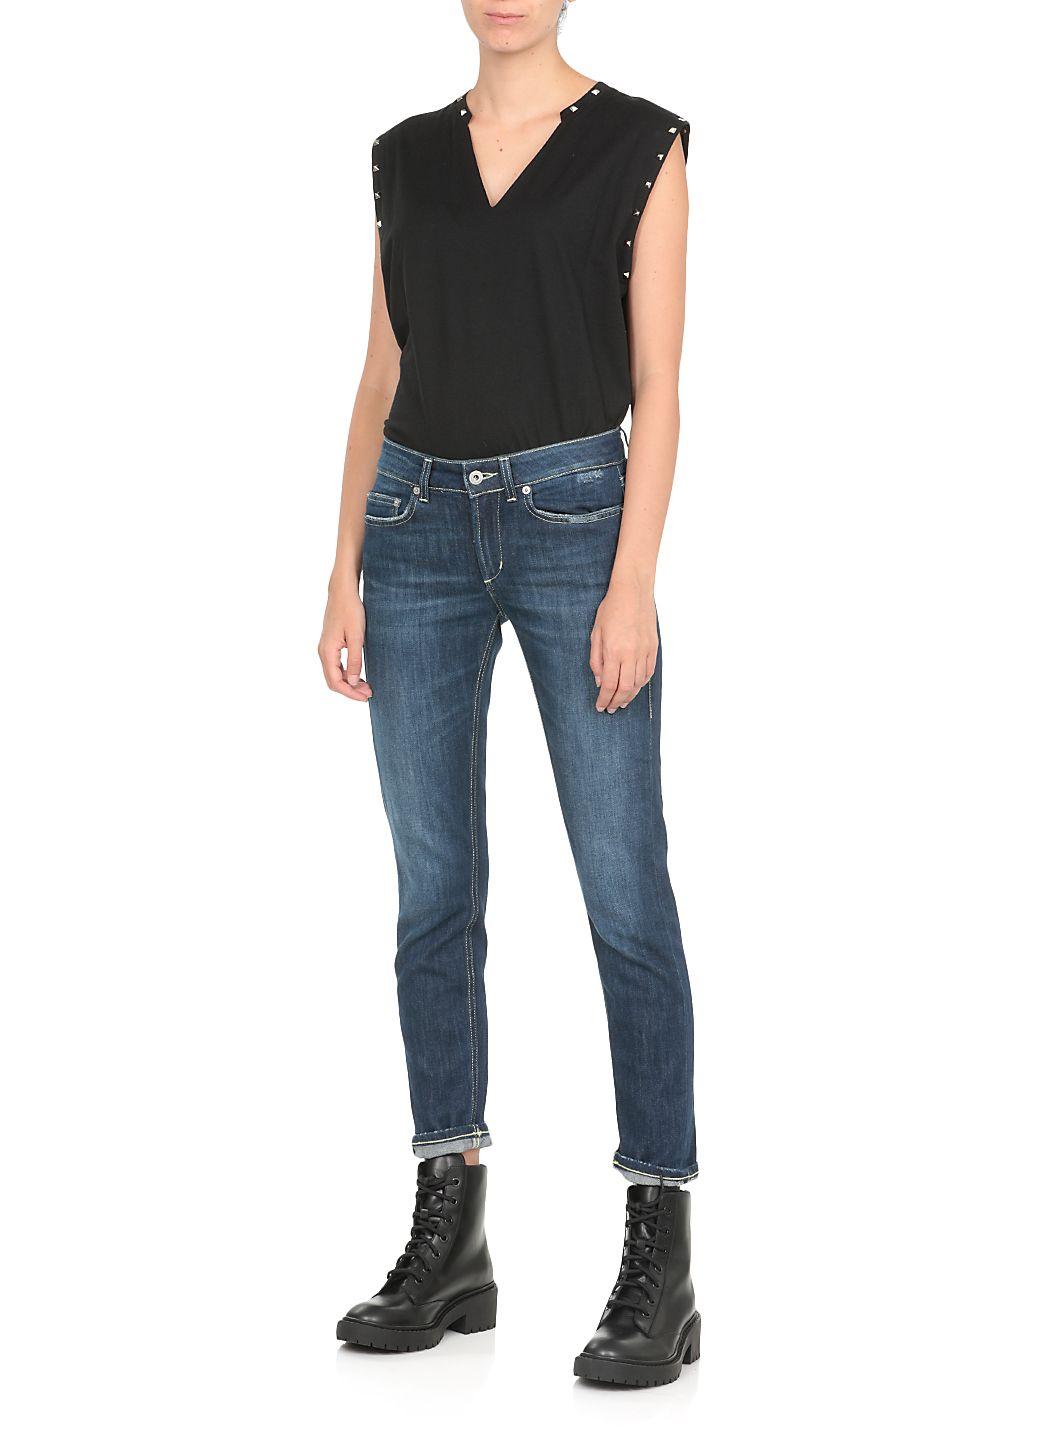 Monroe jeans